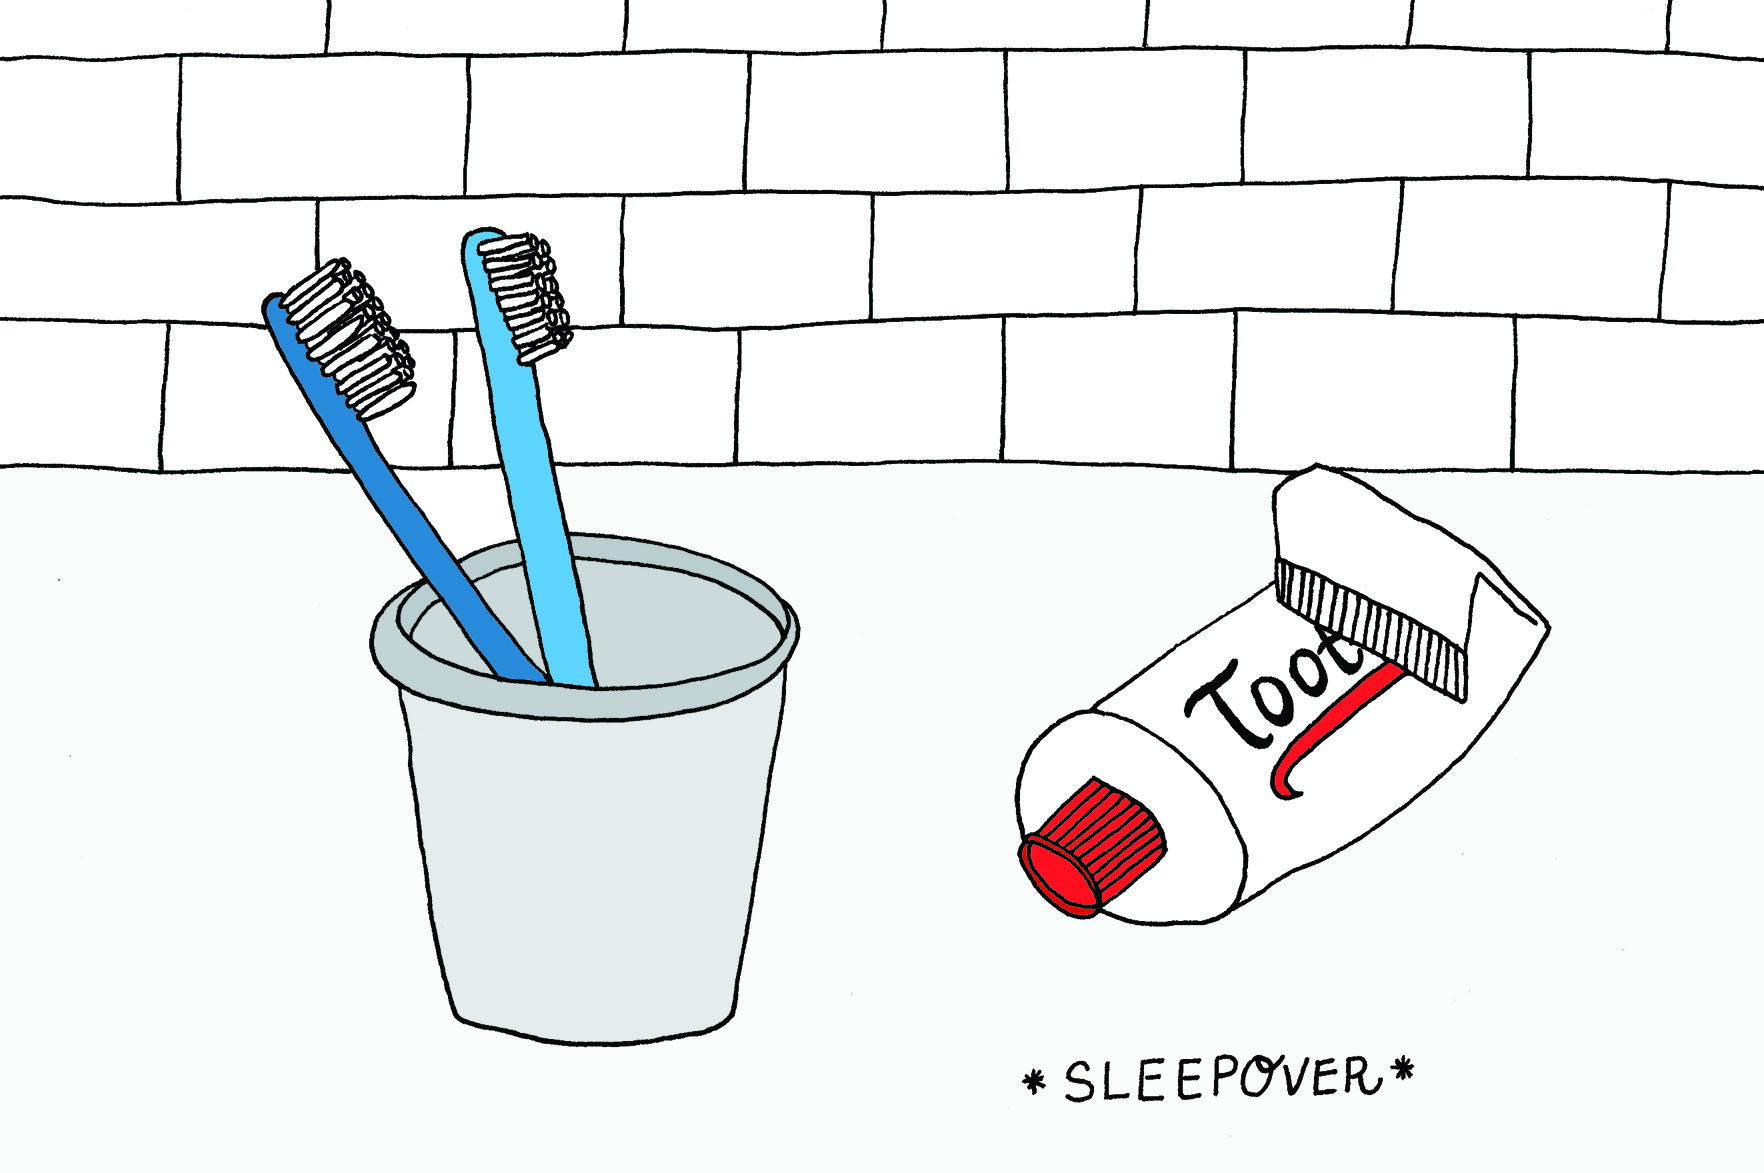 sleepover.jpg